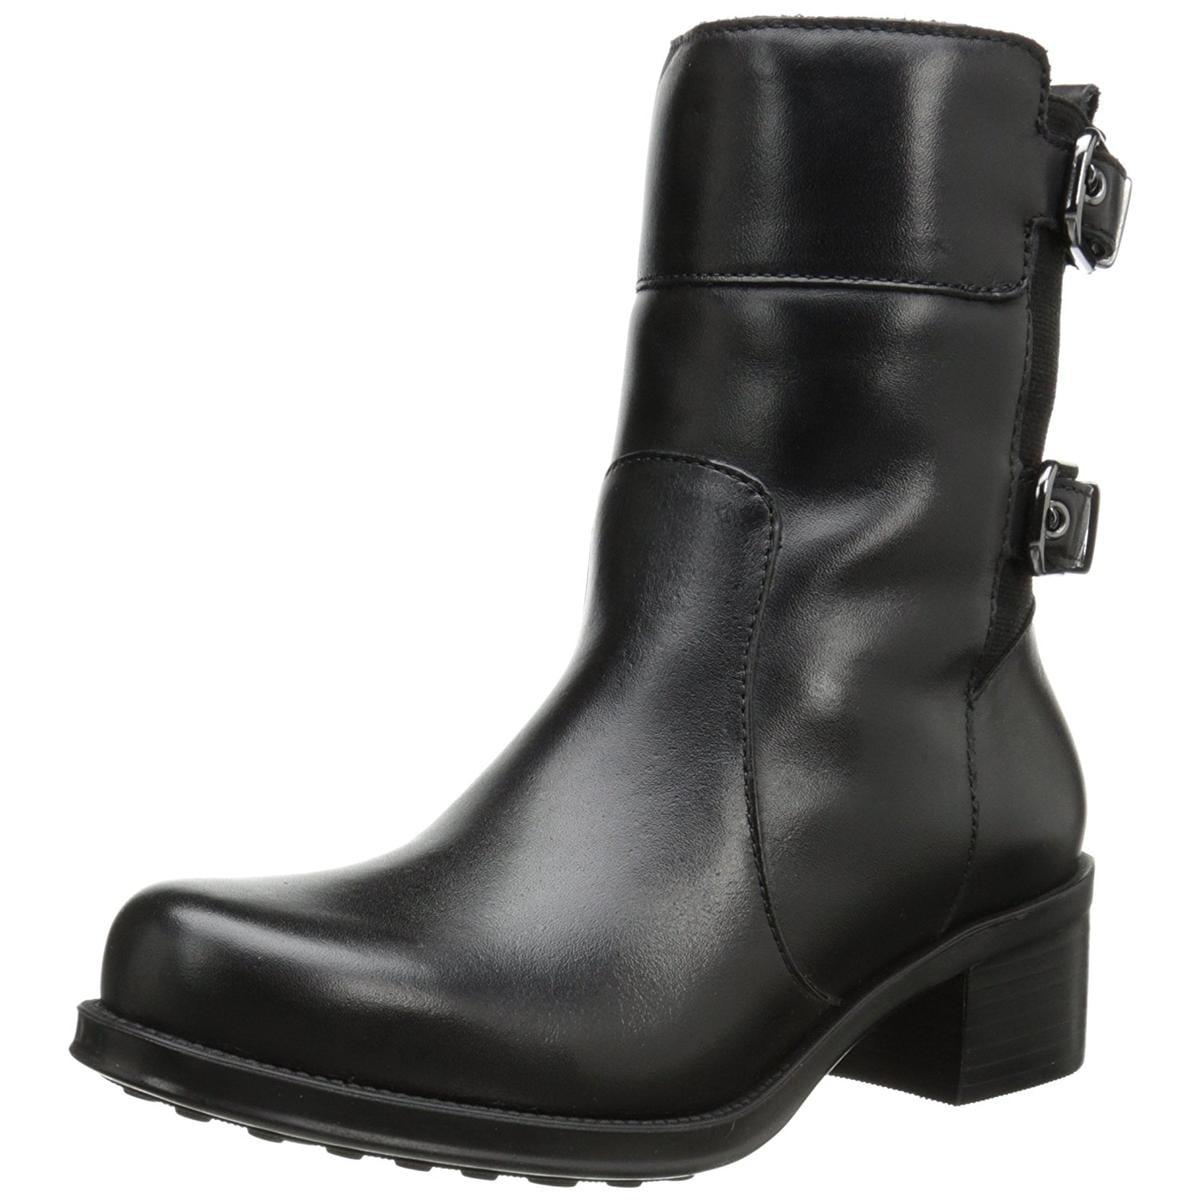 Andre Assous Women's Laura-A Black Waterproof Leather Boots 37.5 EU/7.5M US